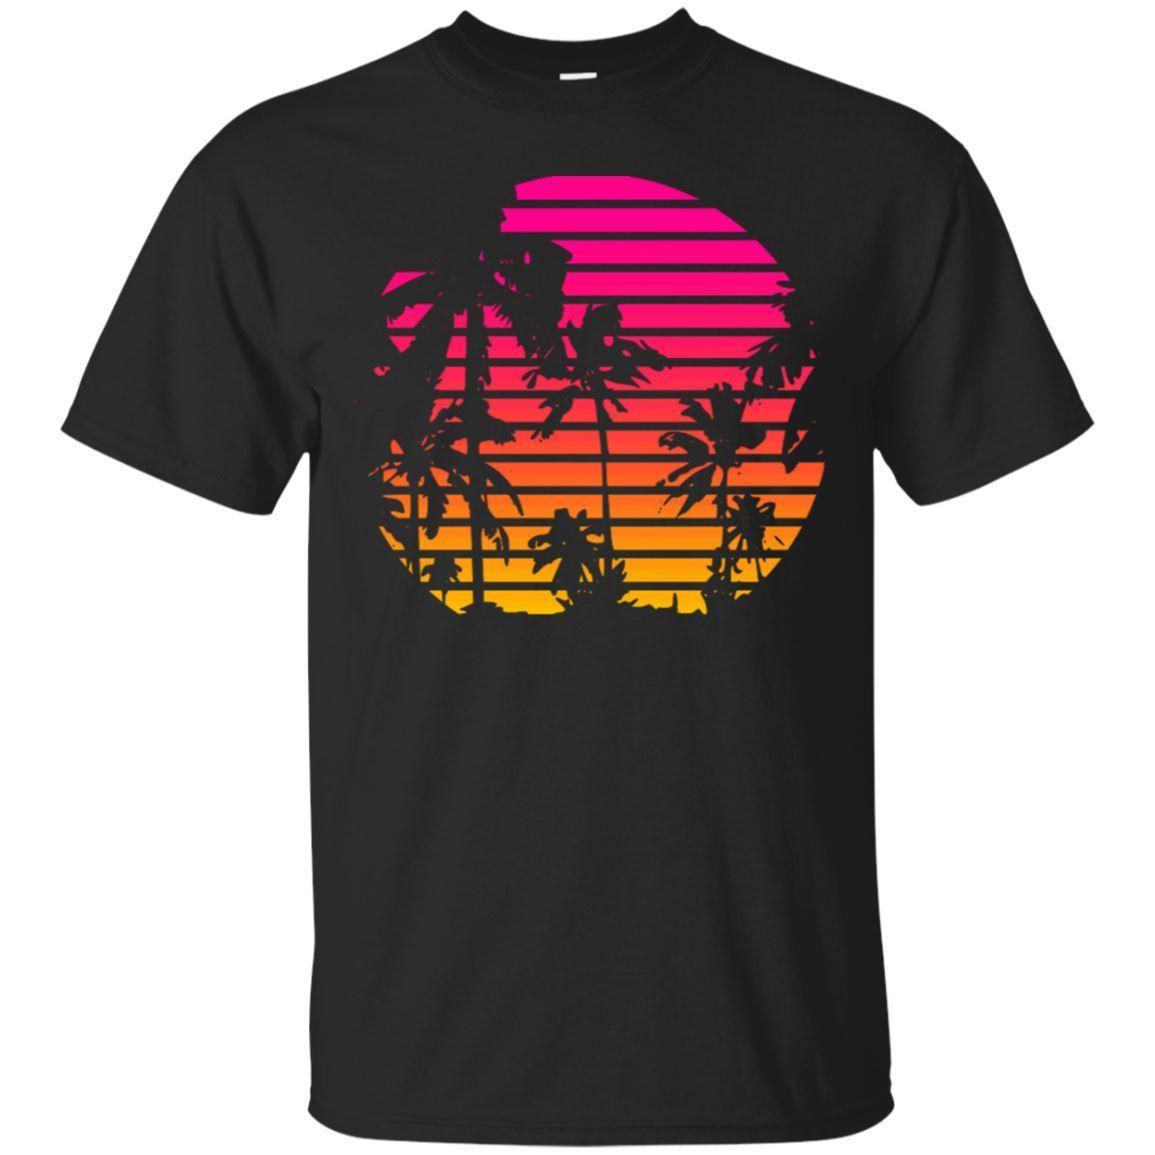 Black, Navy T-Shirt - Sunset Palm Tree - Outrun Synthwave New Retro Wave   Cartoon T Shirt Men Unisex New Fashion Tshirt